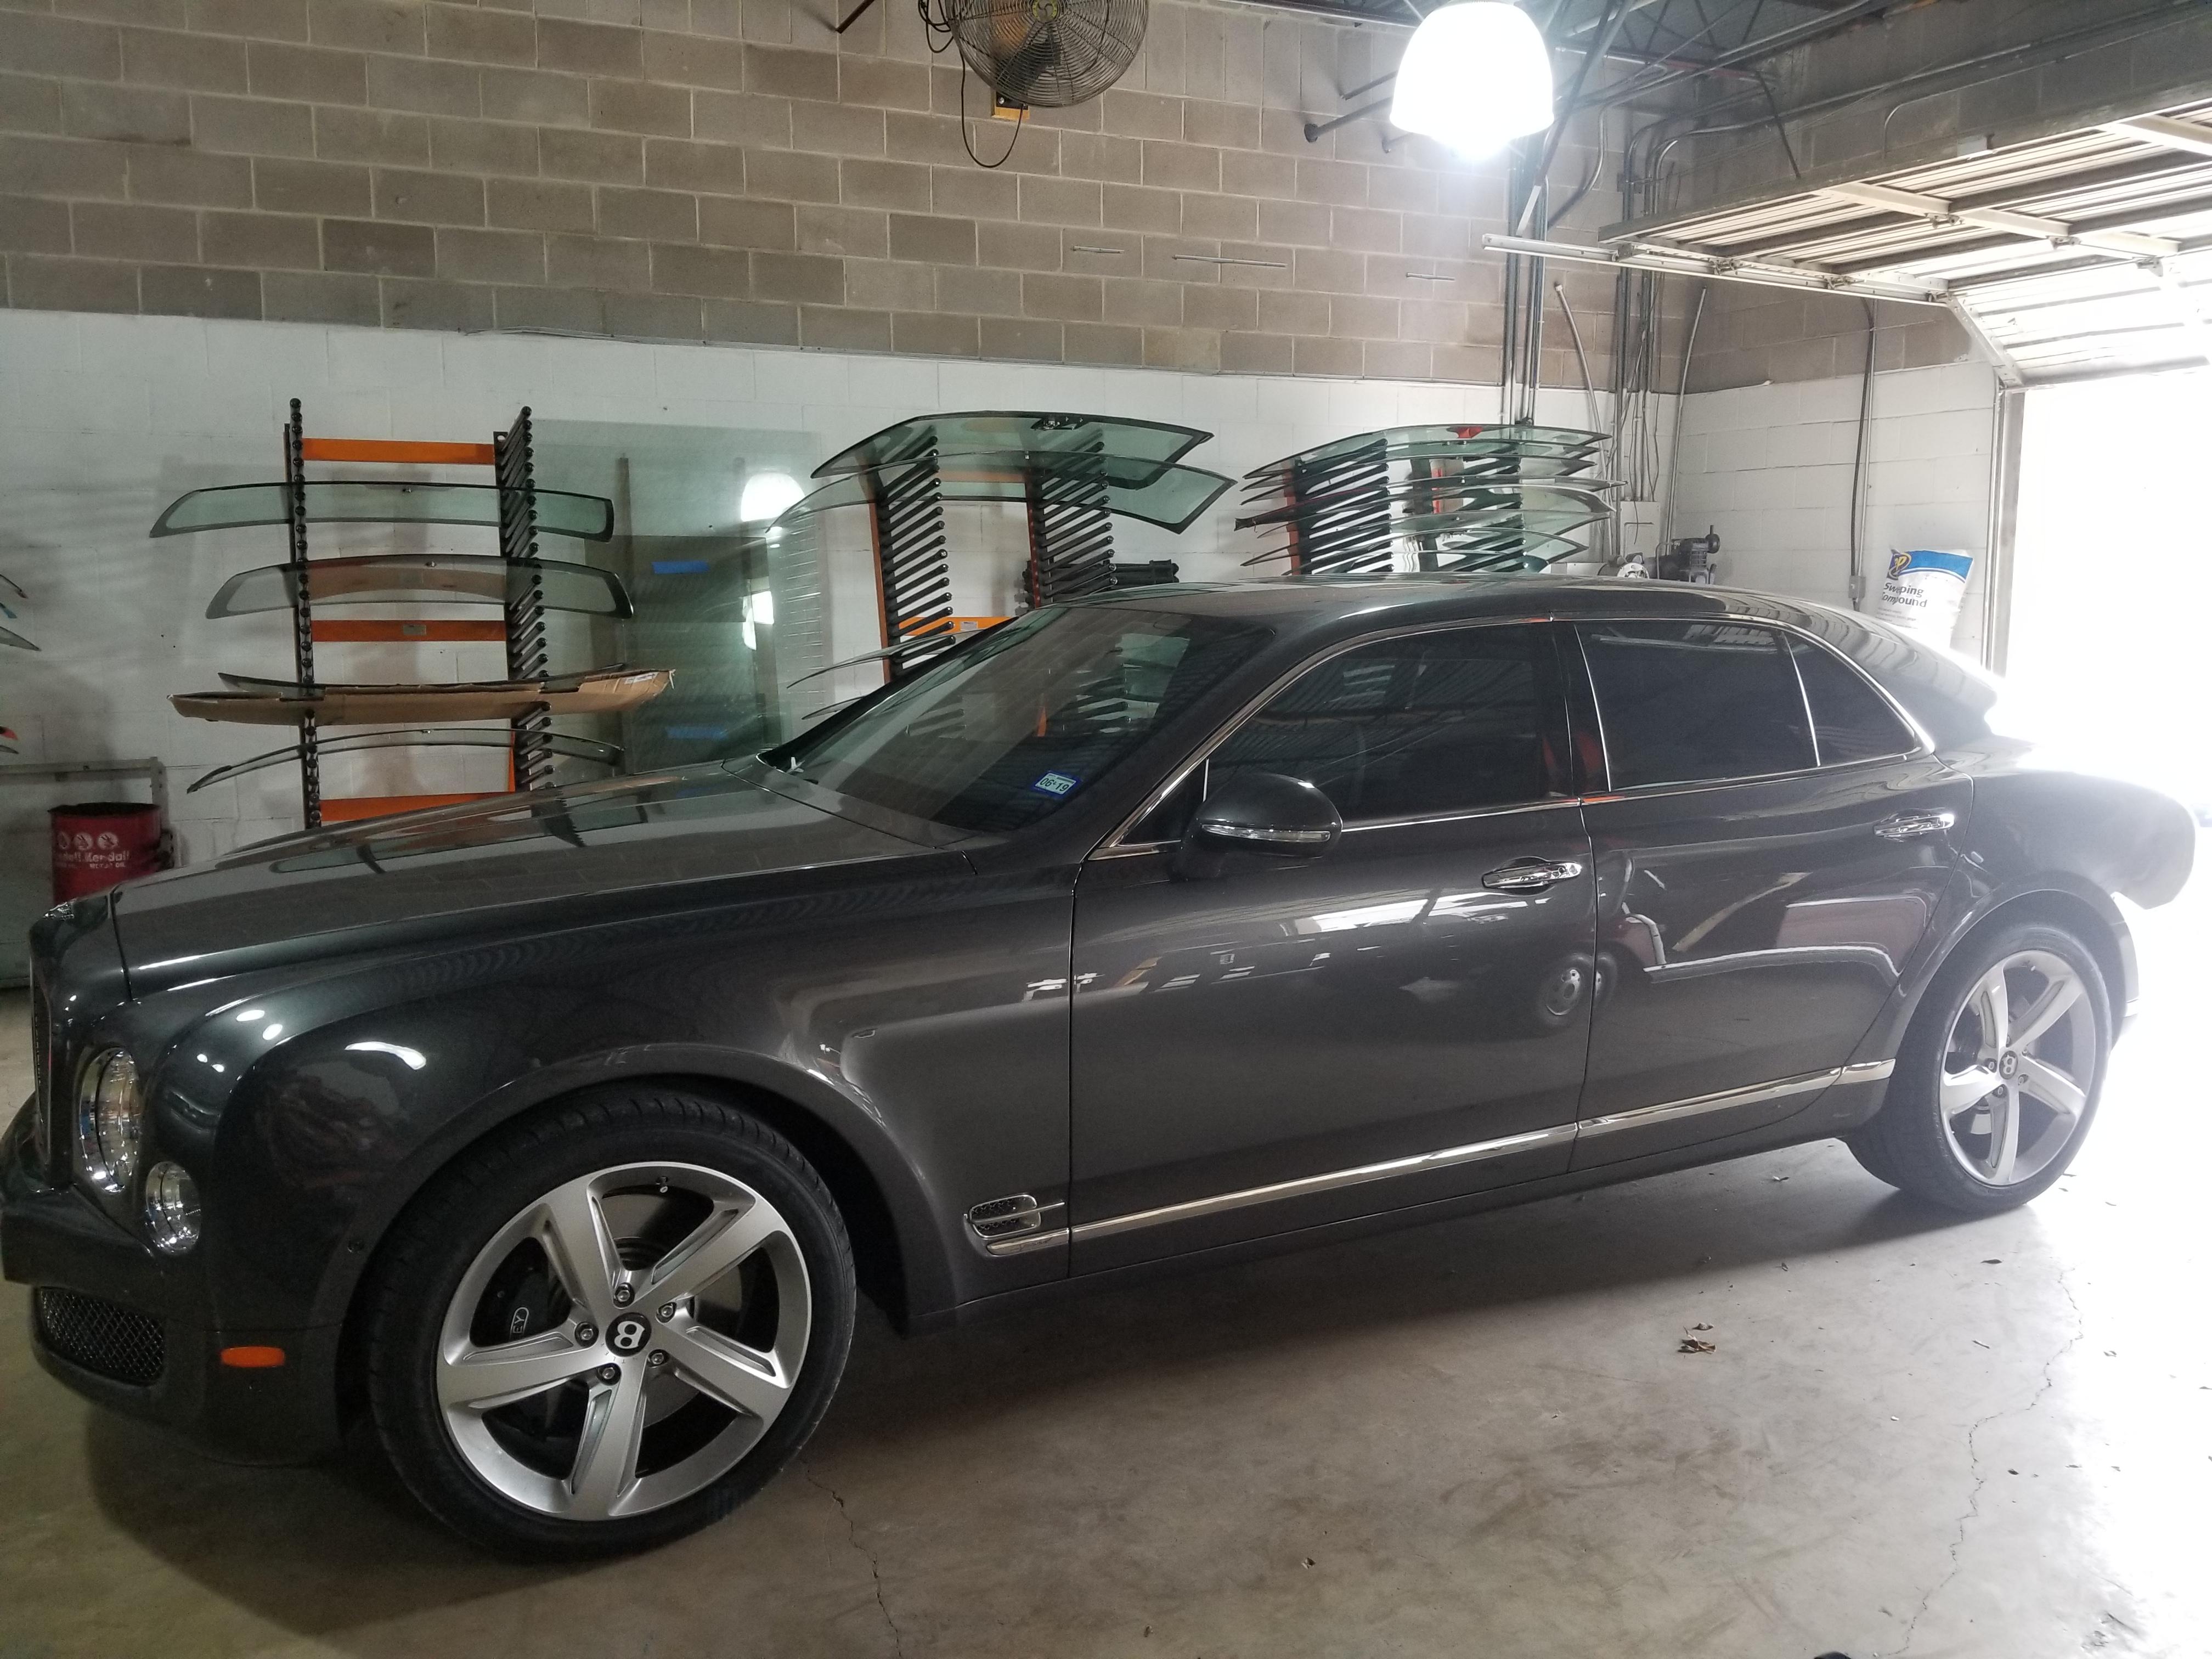 San Antonio Auto Glass Repair Luxury Car Bentley Stone Oak Alamo Heights